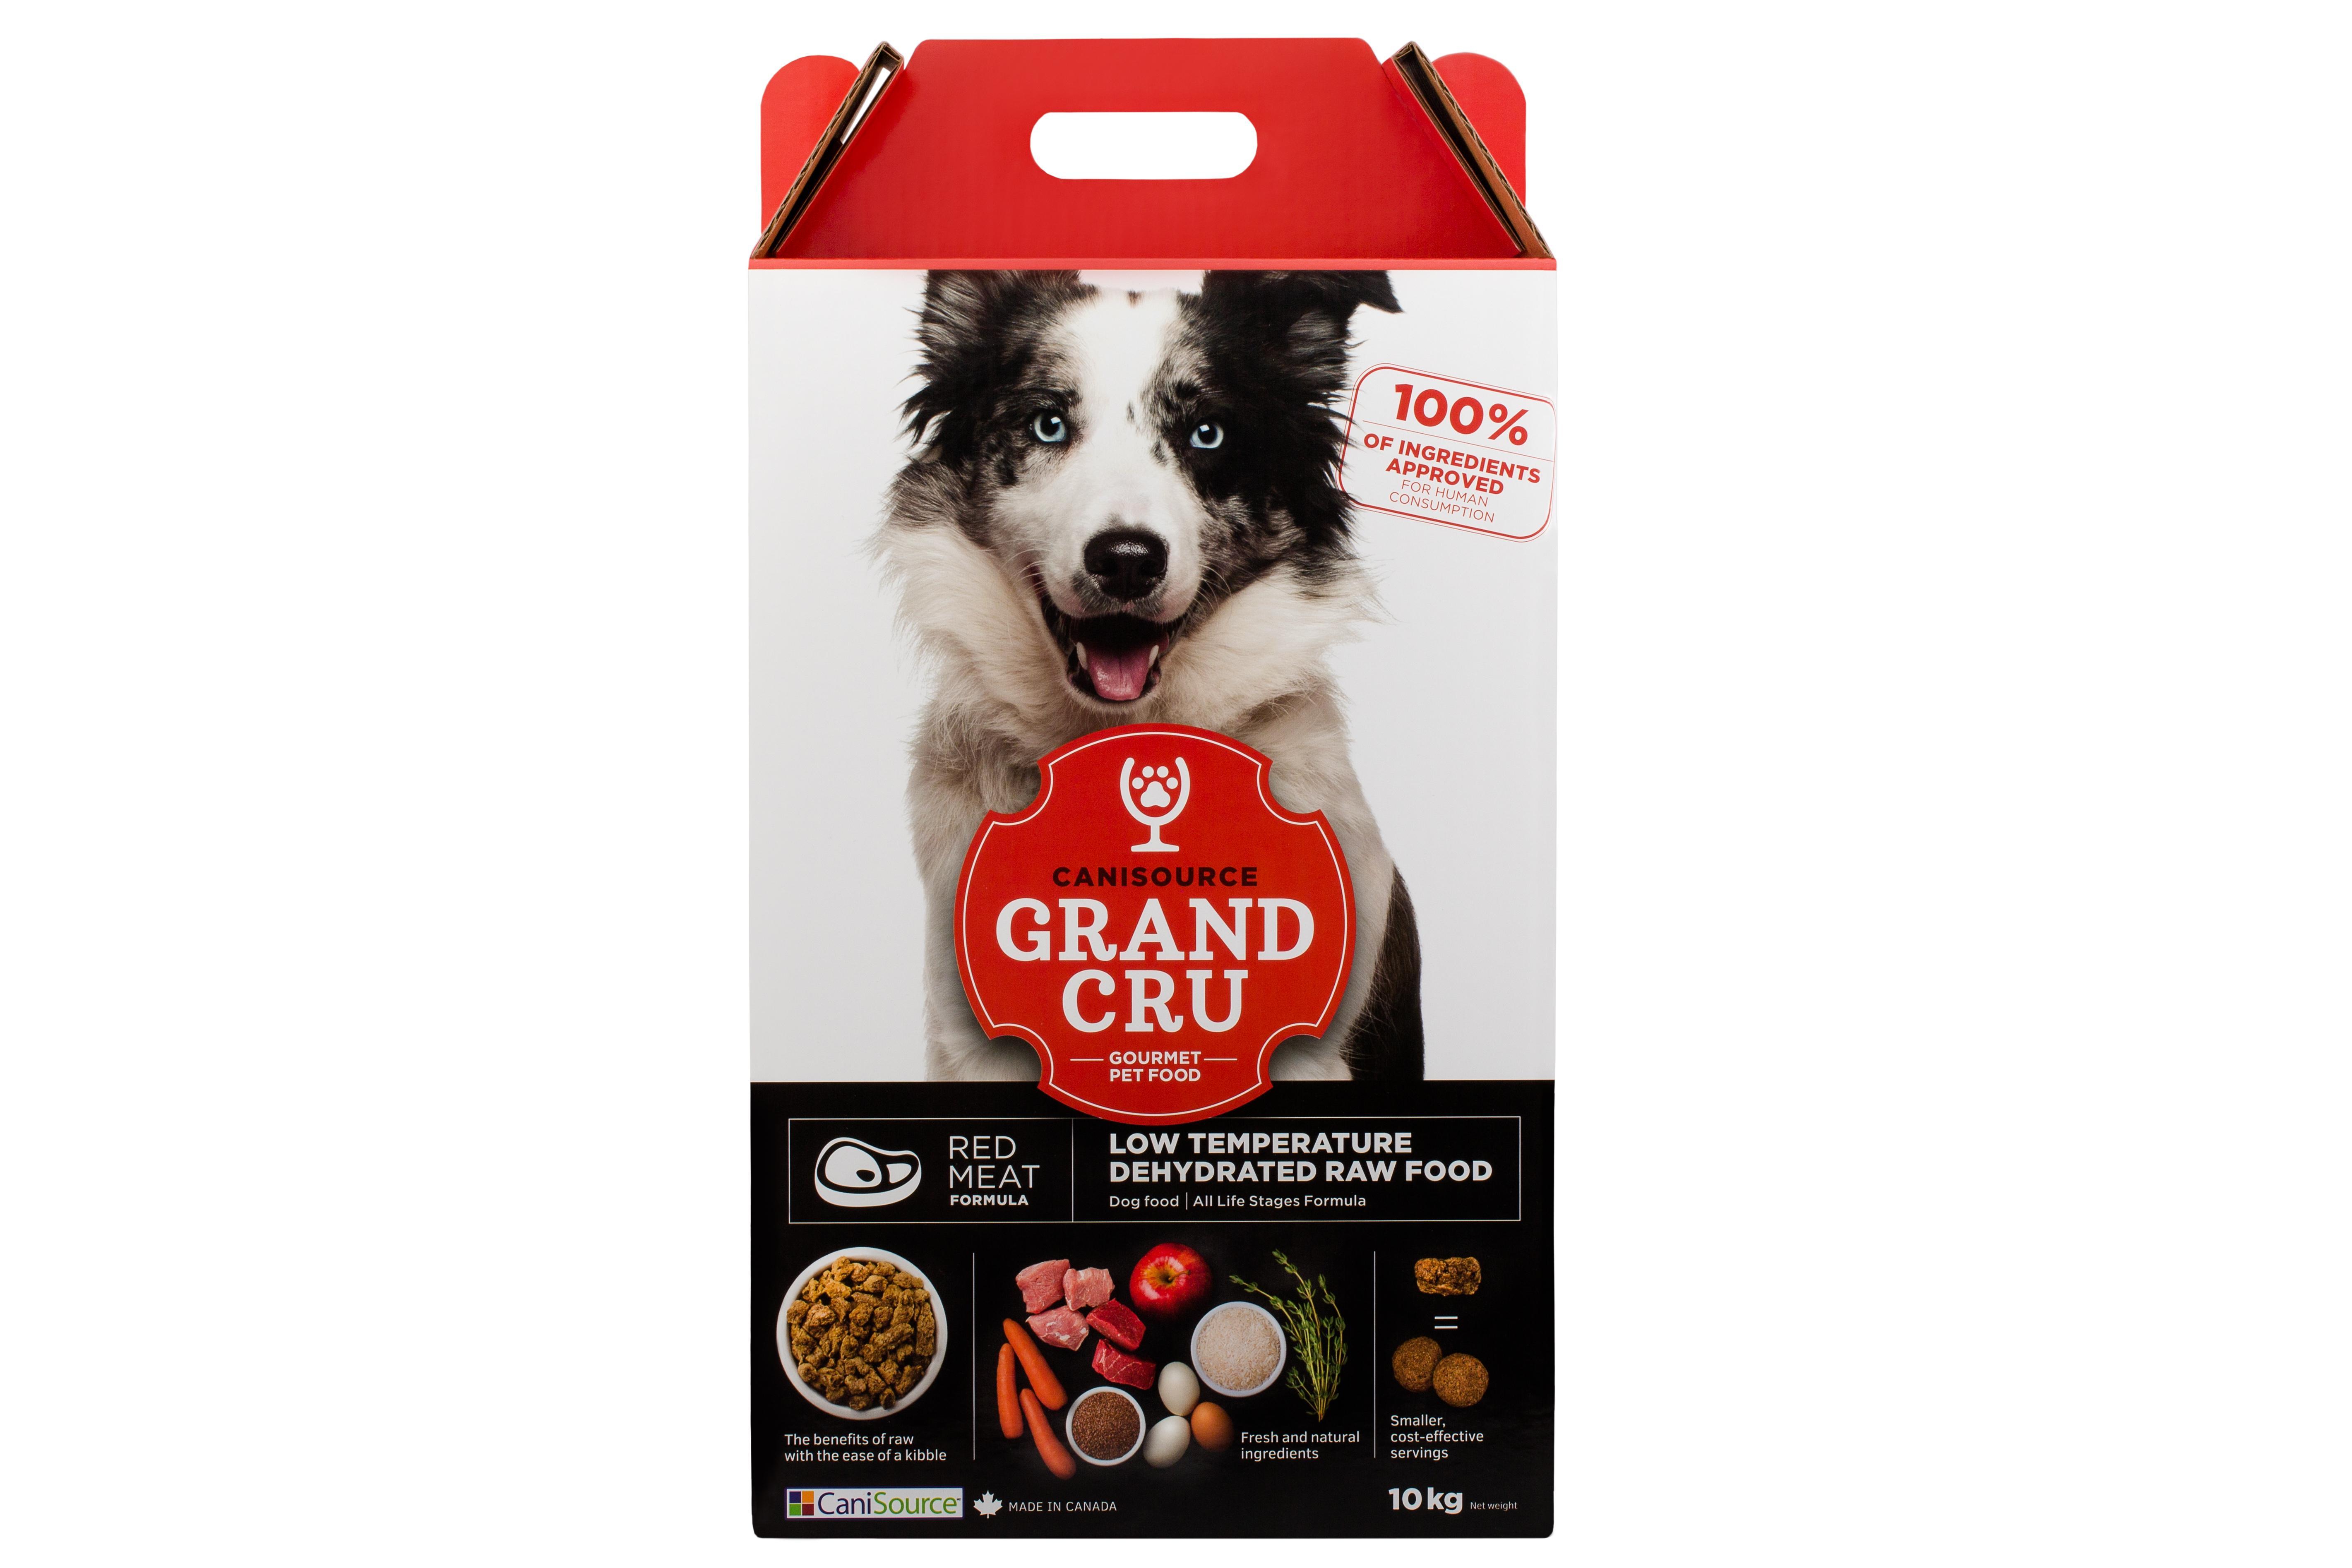 CaniSource Grand Cru Red Meat Formula Dehydrated Dog Food, 10-kg